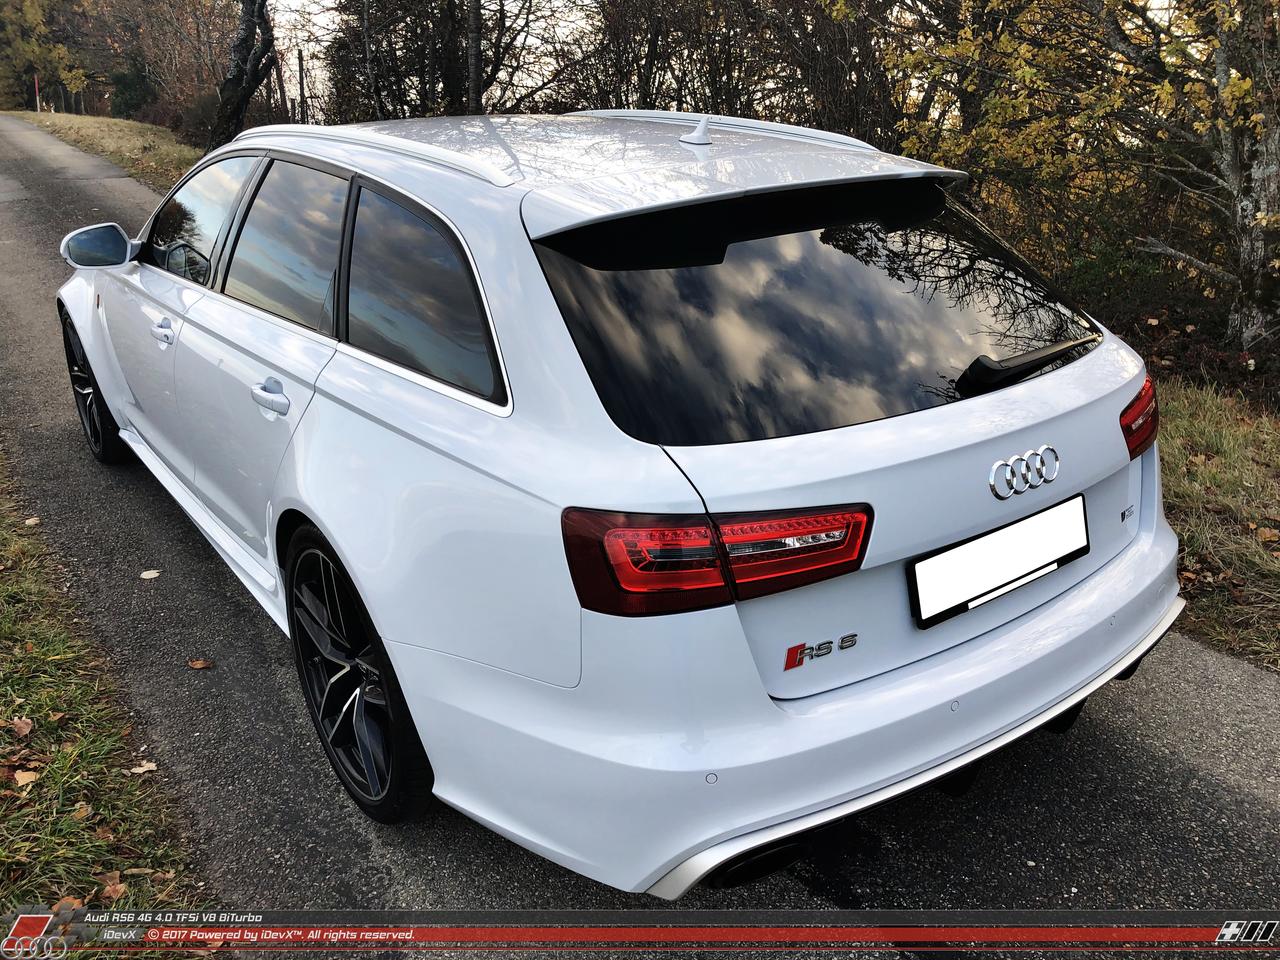 09_11.2018_Audi-RS6_iDevX_009.png